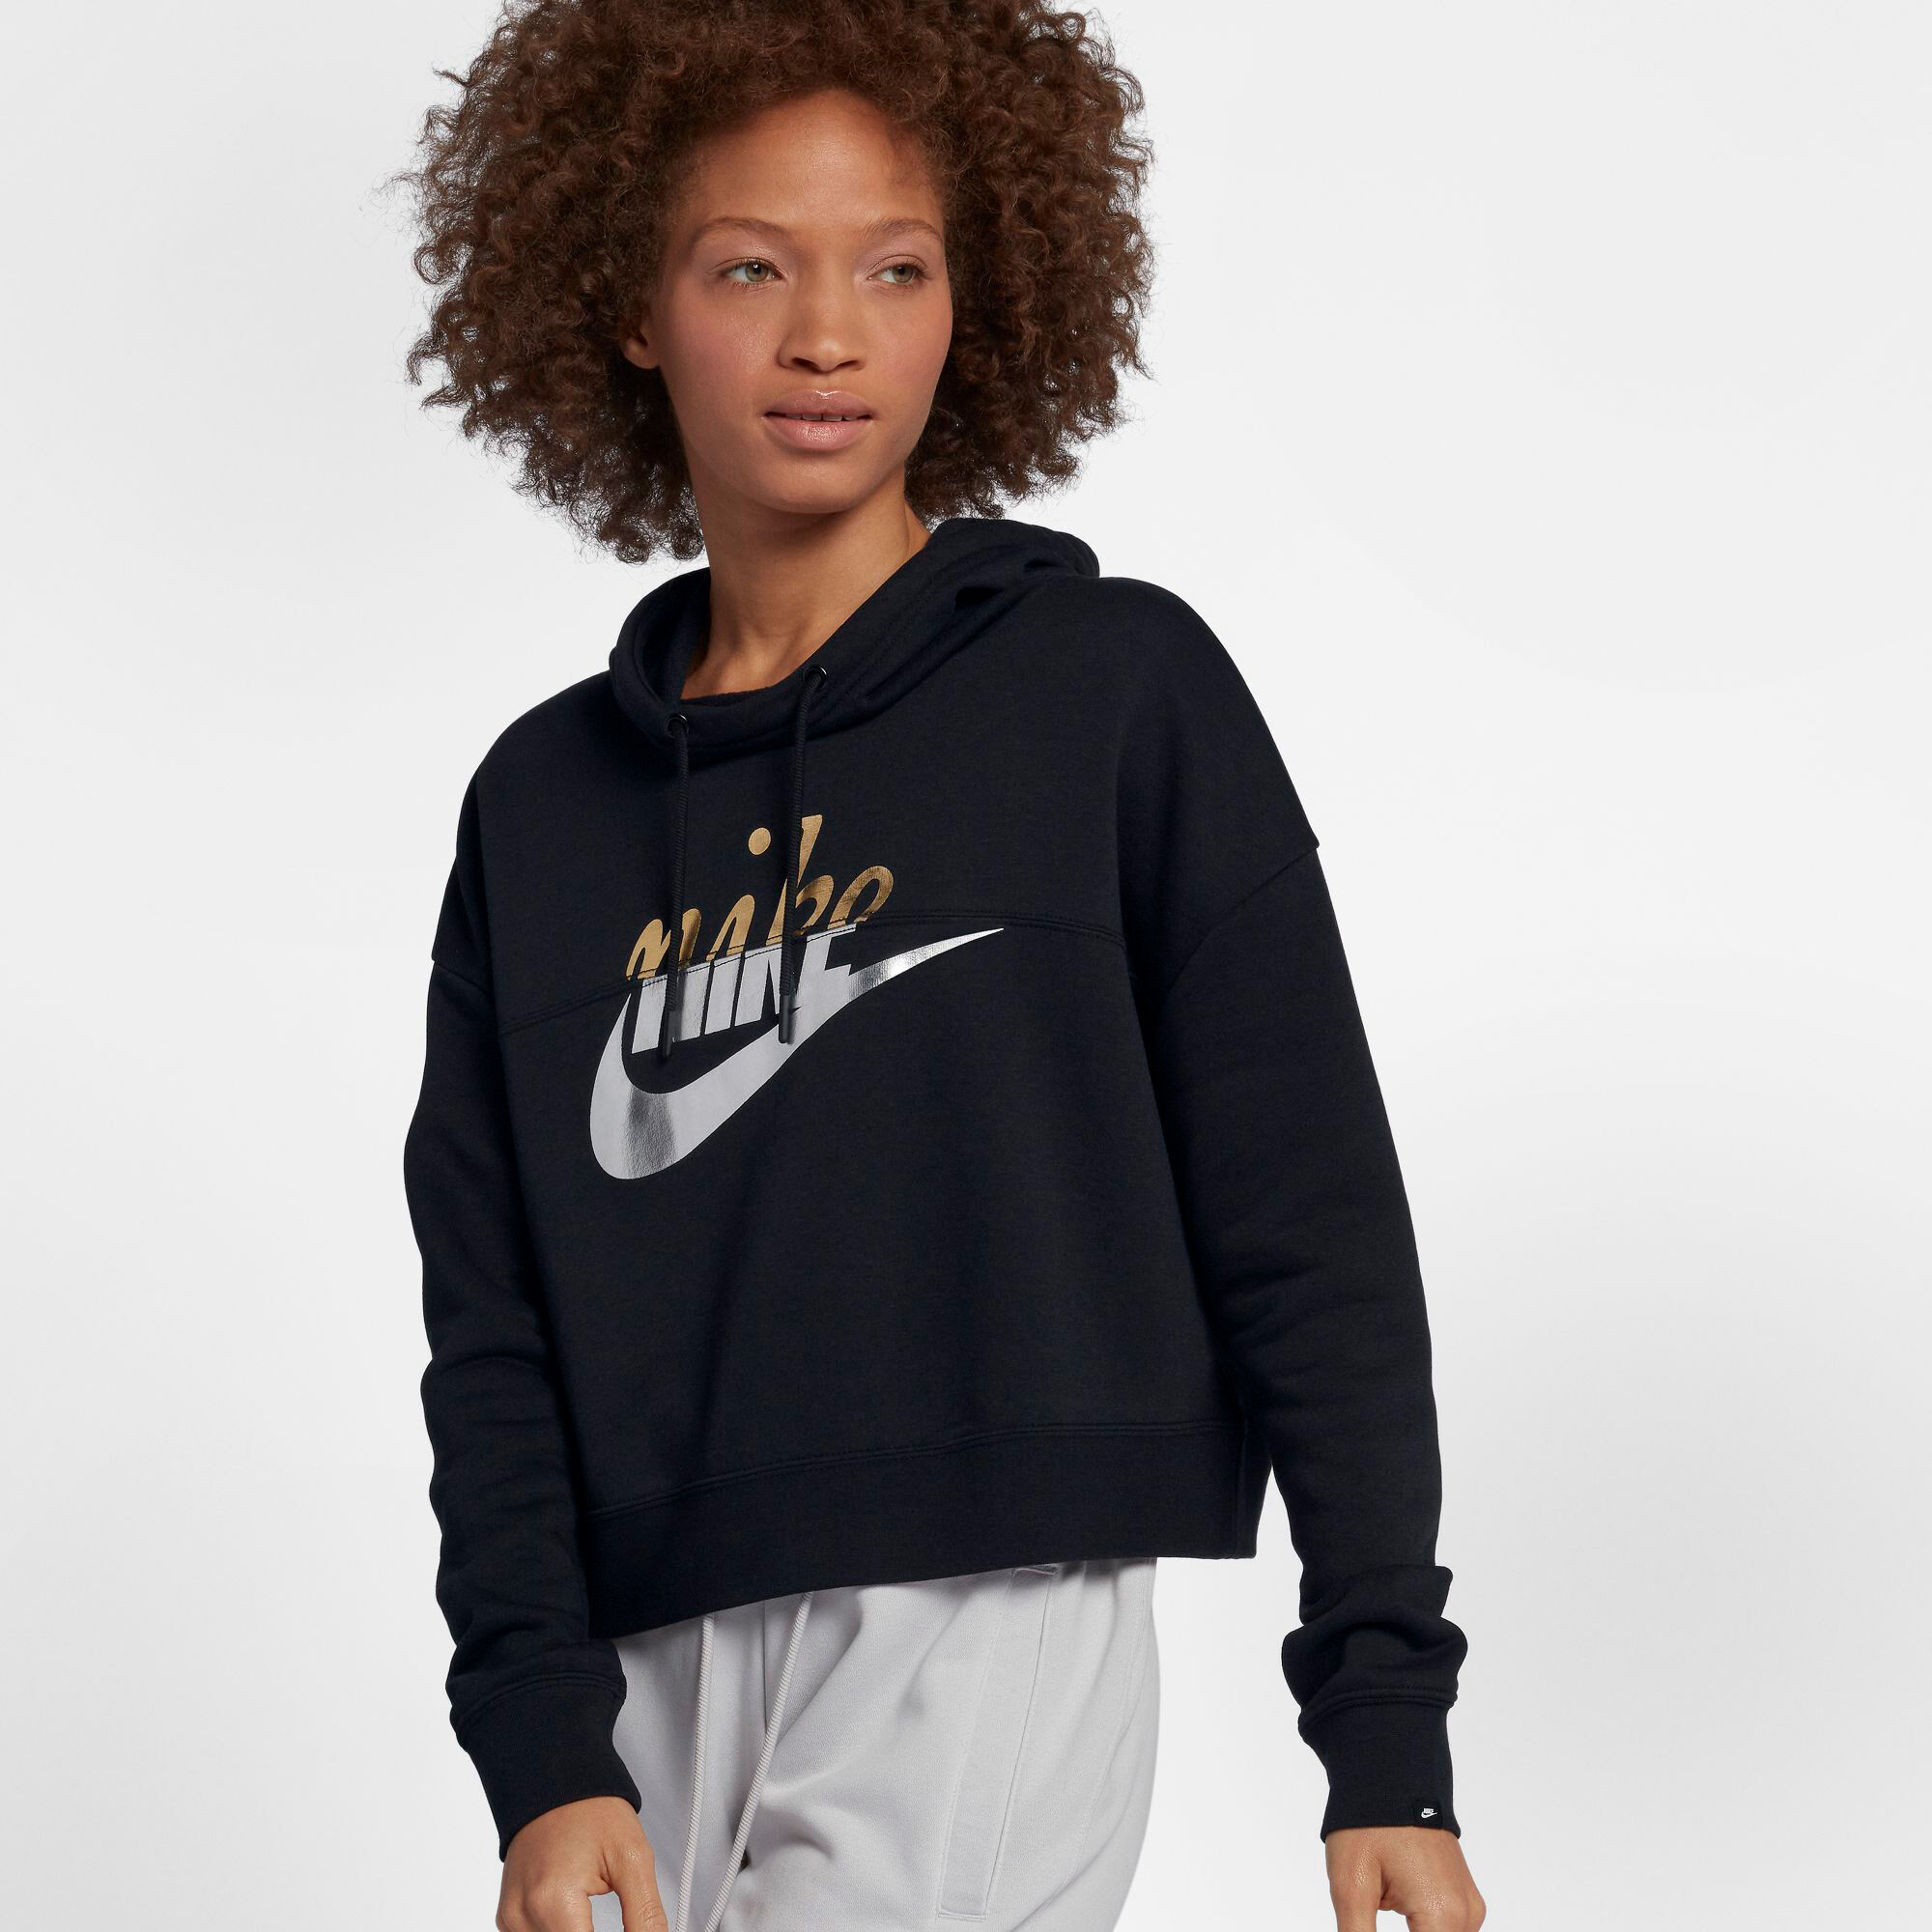 Mujer Nike Fitness Sudaderas Intersport Ynvoqvp A 9YD2IEHeW